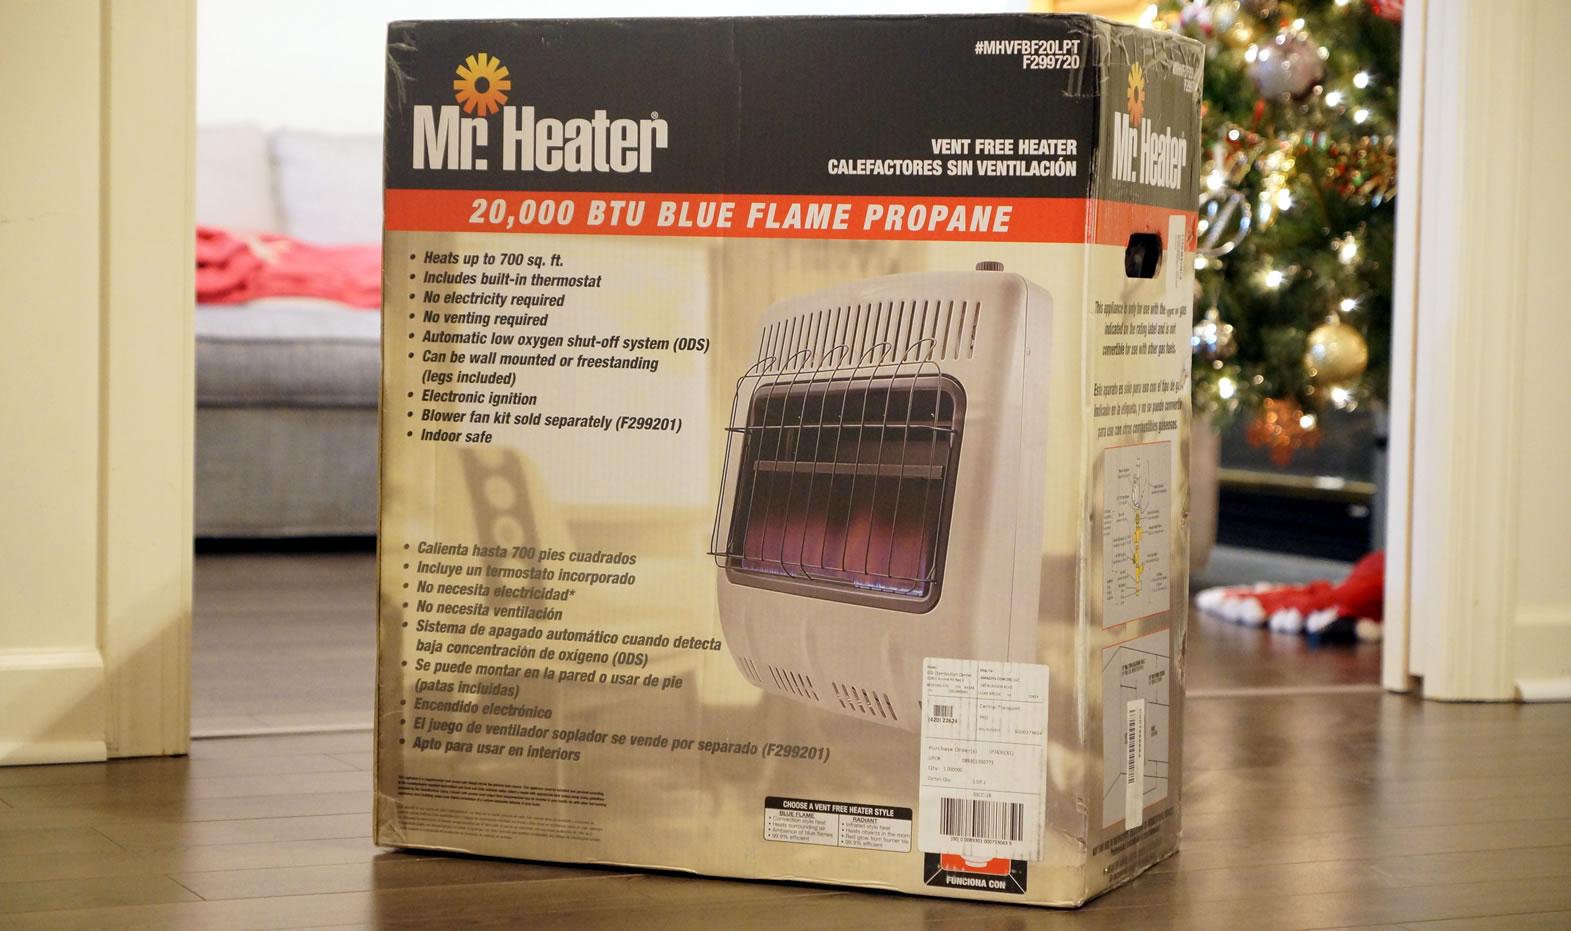 Vent Free Liquid Propane Heater For Garage Cheaper To